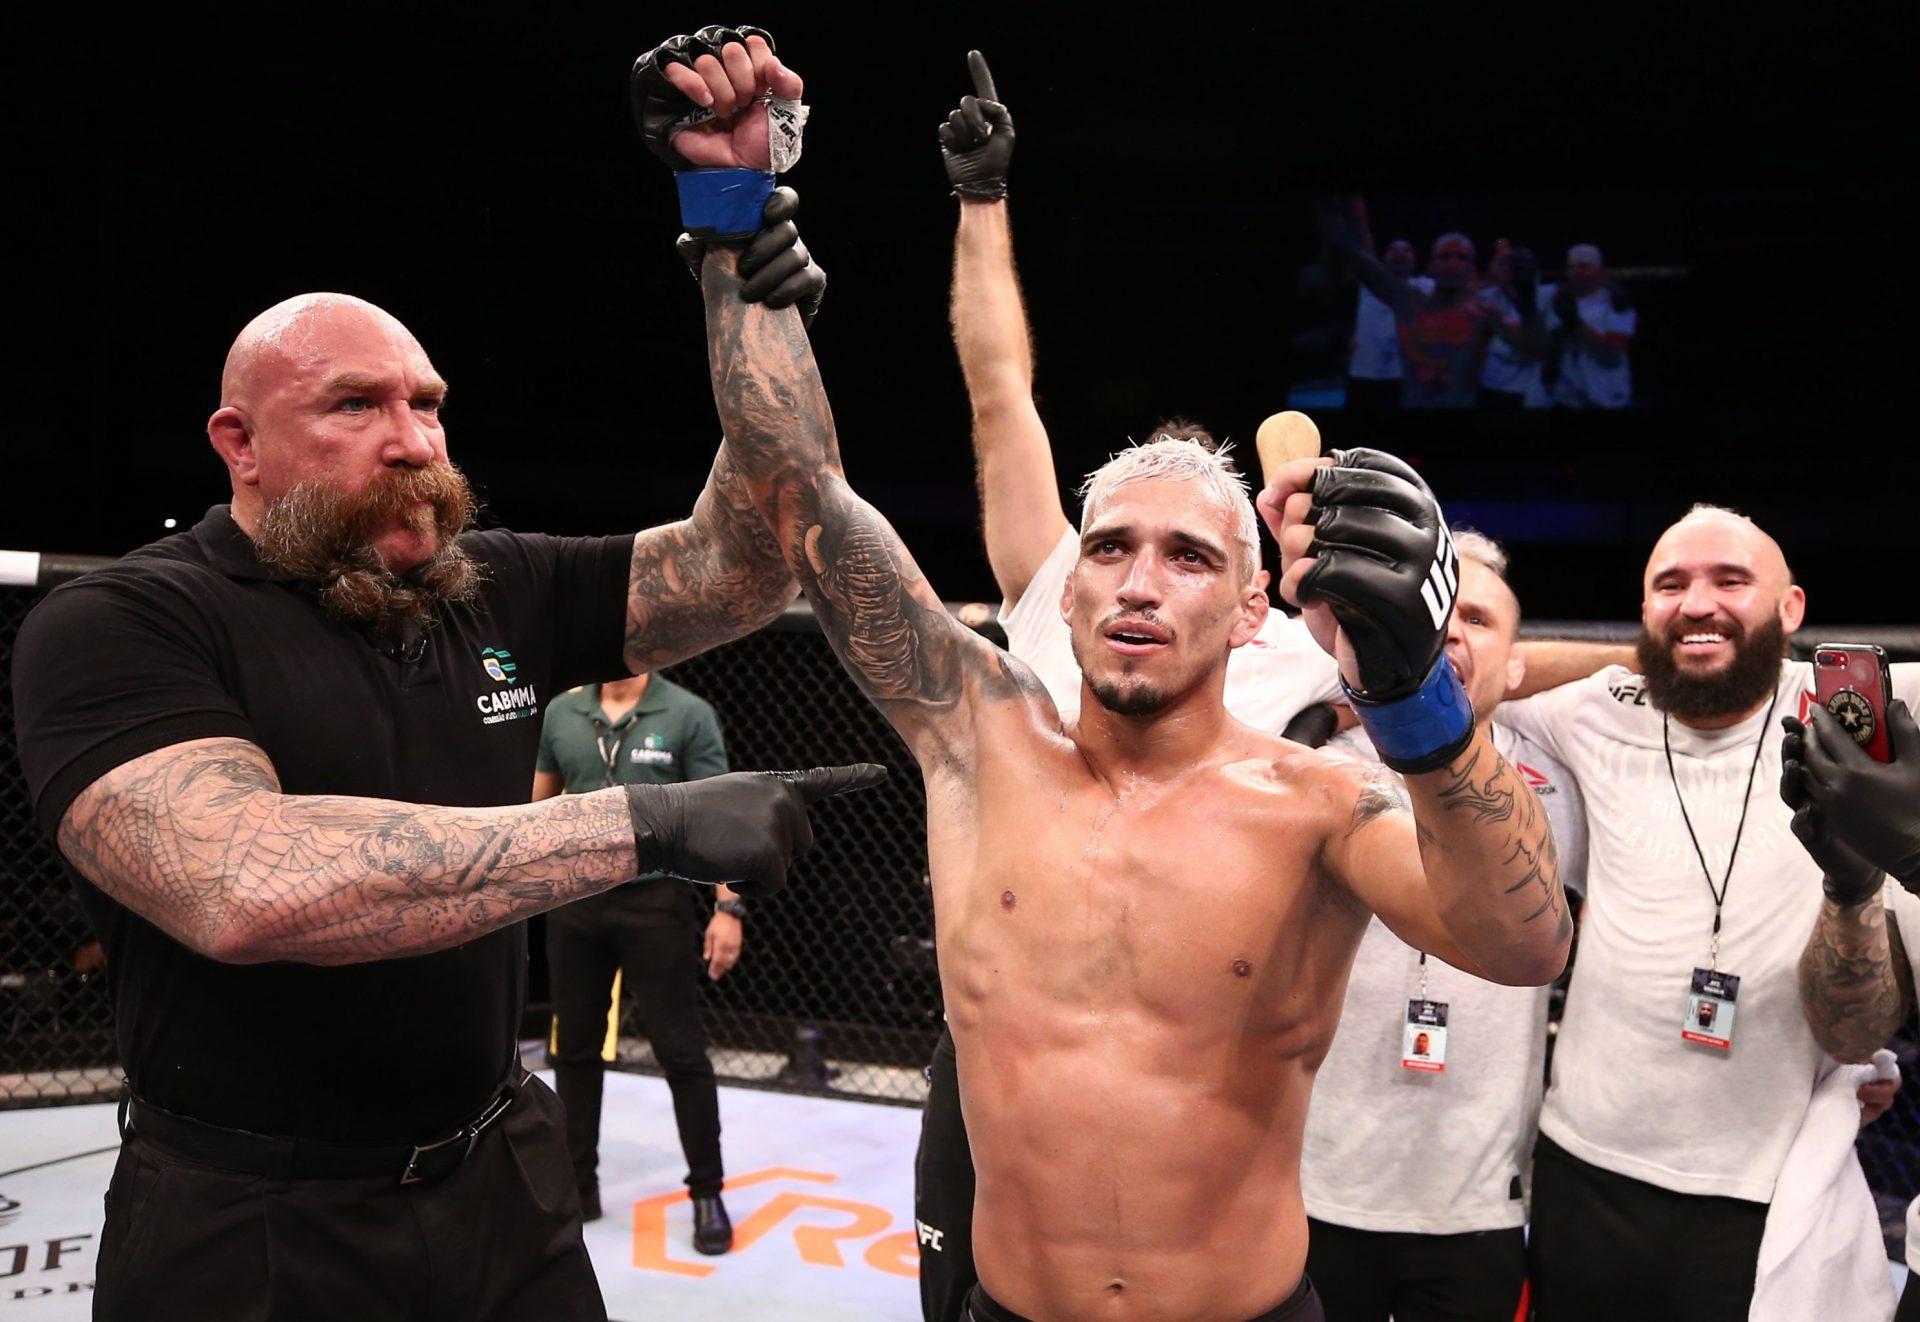 Charles Oliveira wants to fight the winner of McGregor vs Poirier - Charles Oliveira